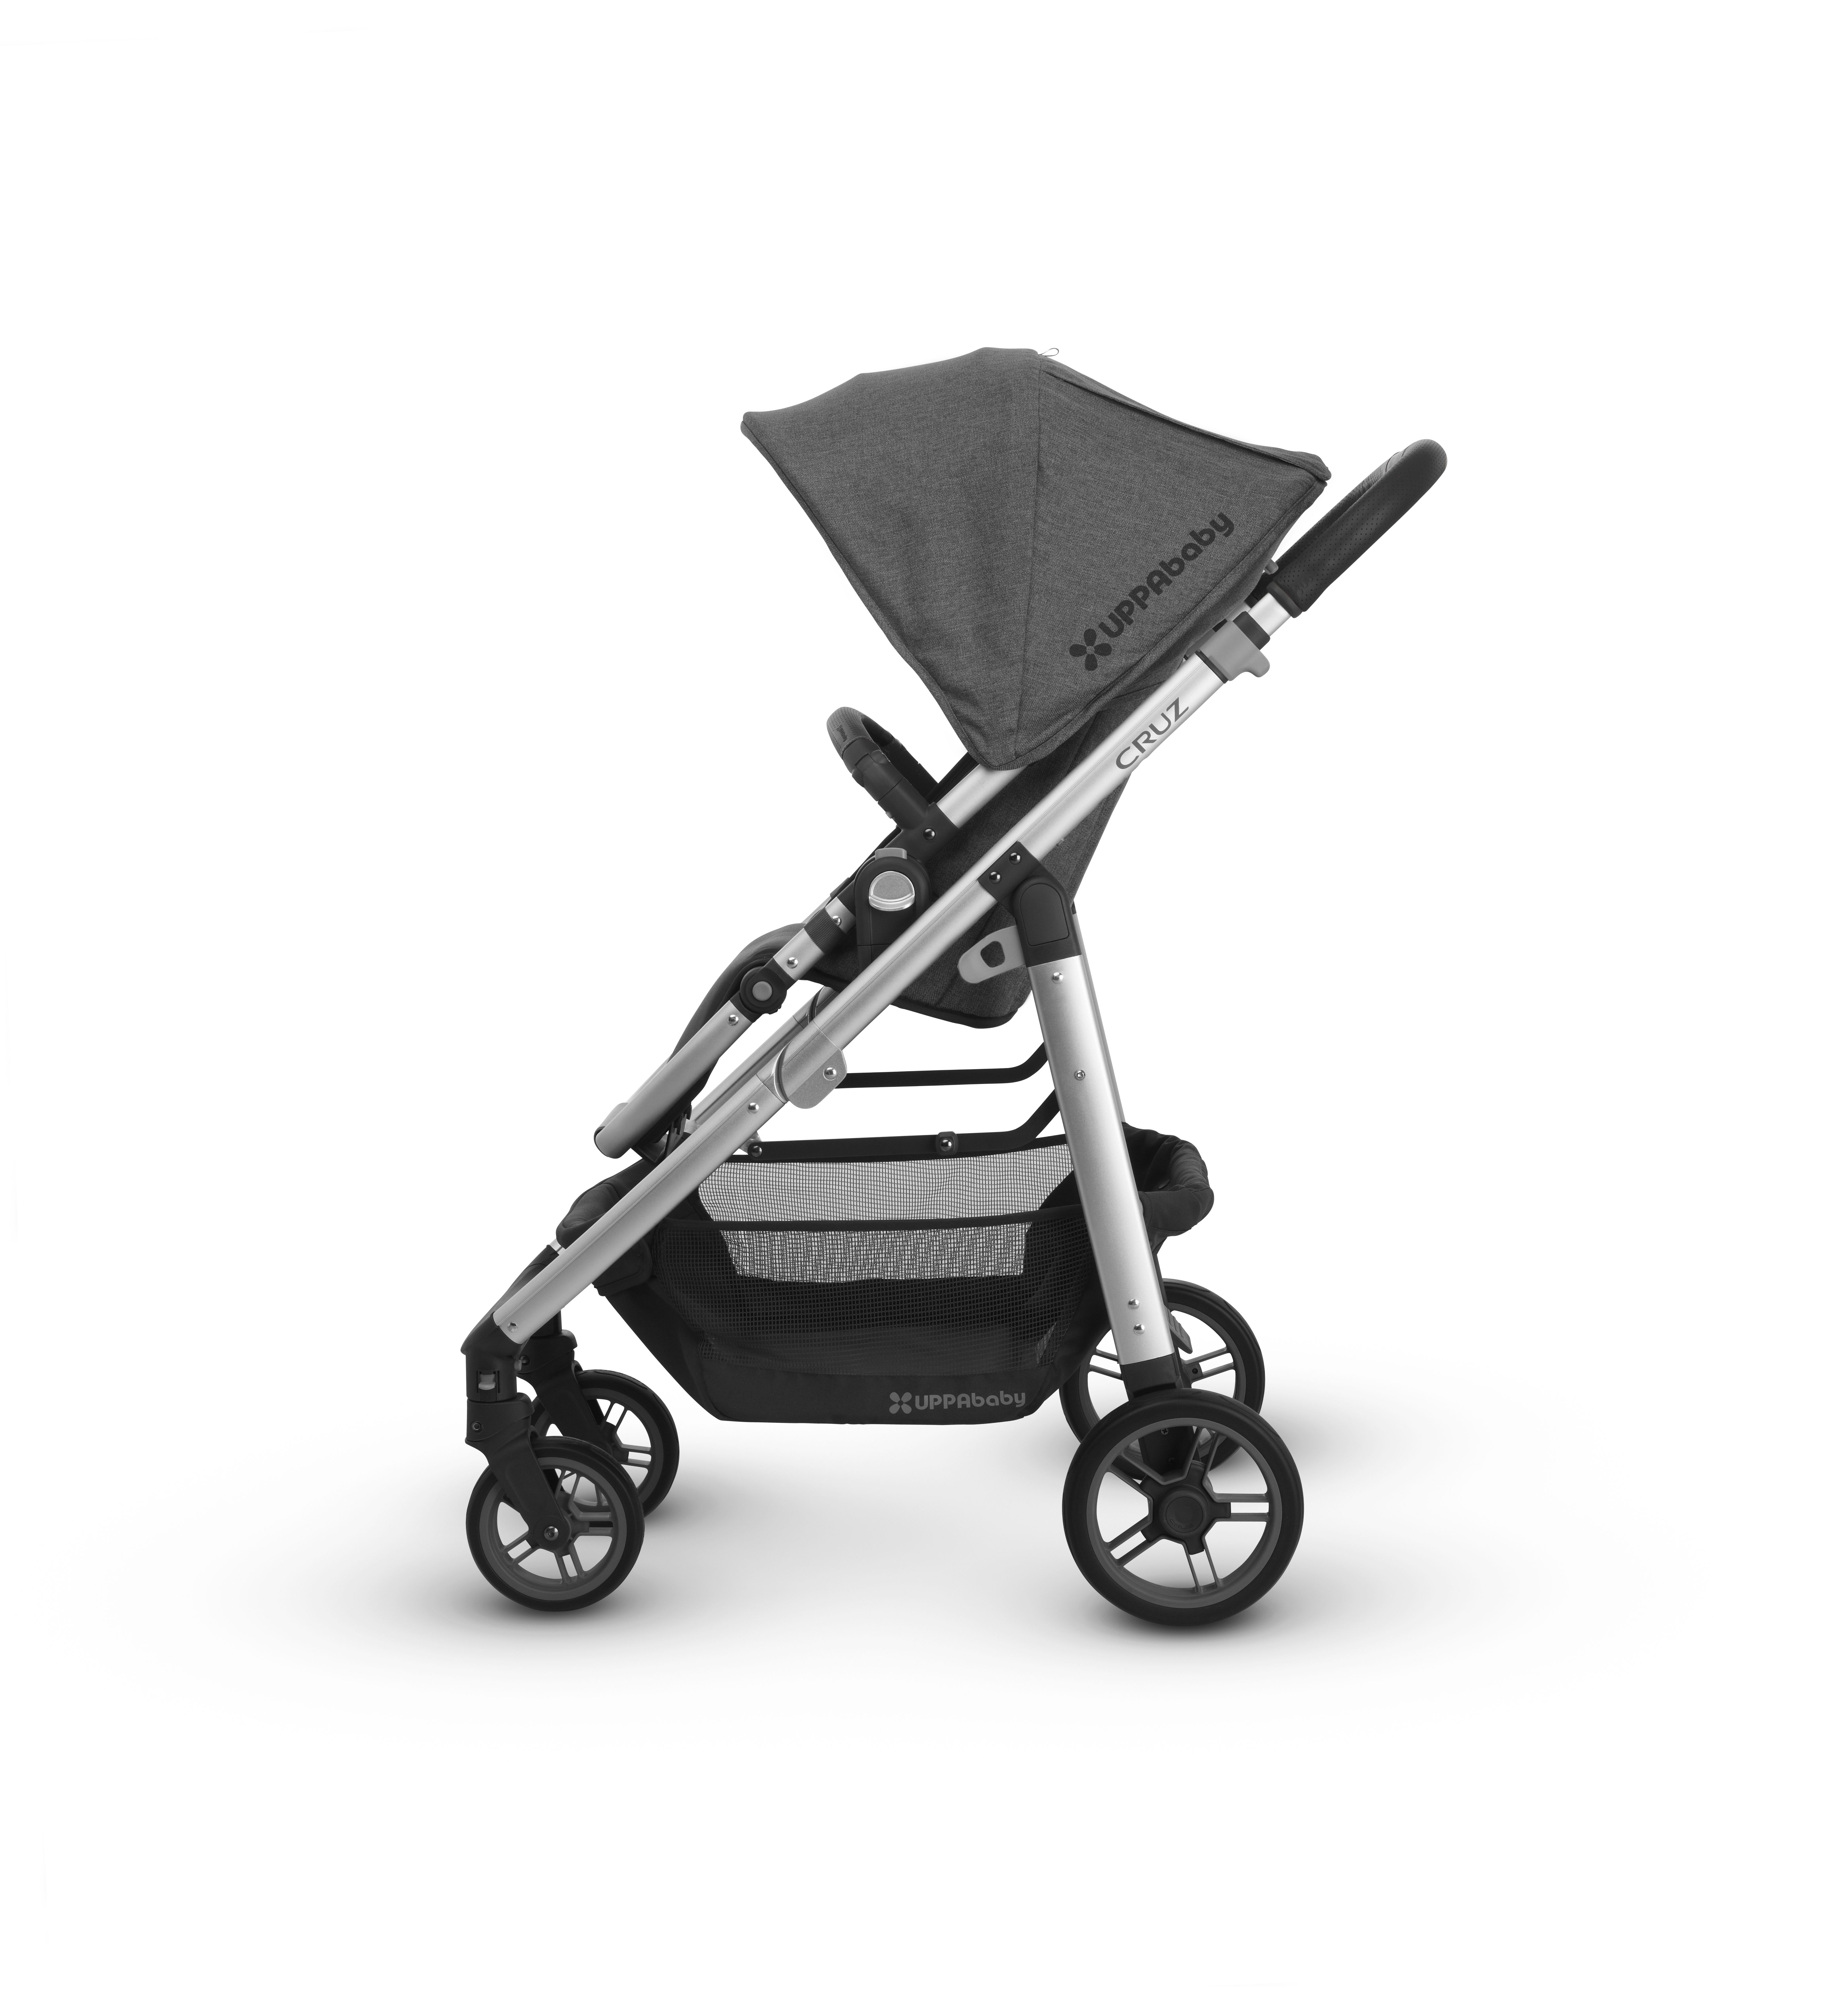 Jordan CRUZ Uppababy stroller, Baby car seats, Baby